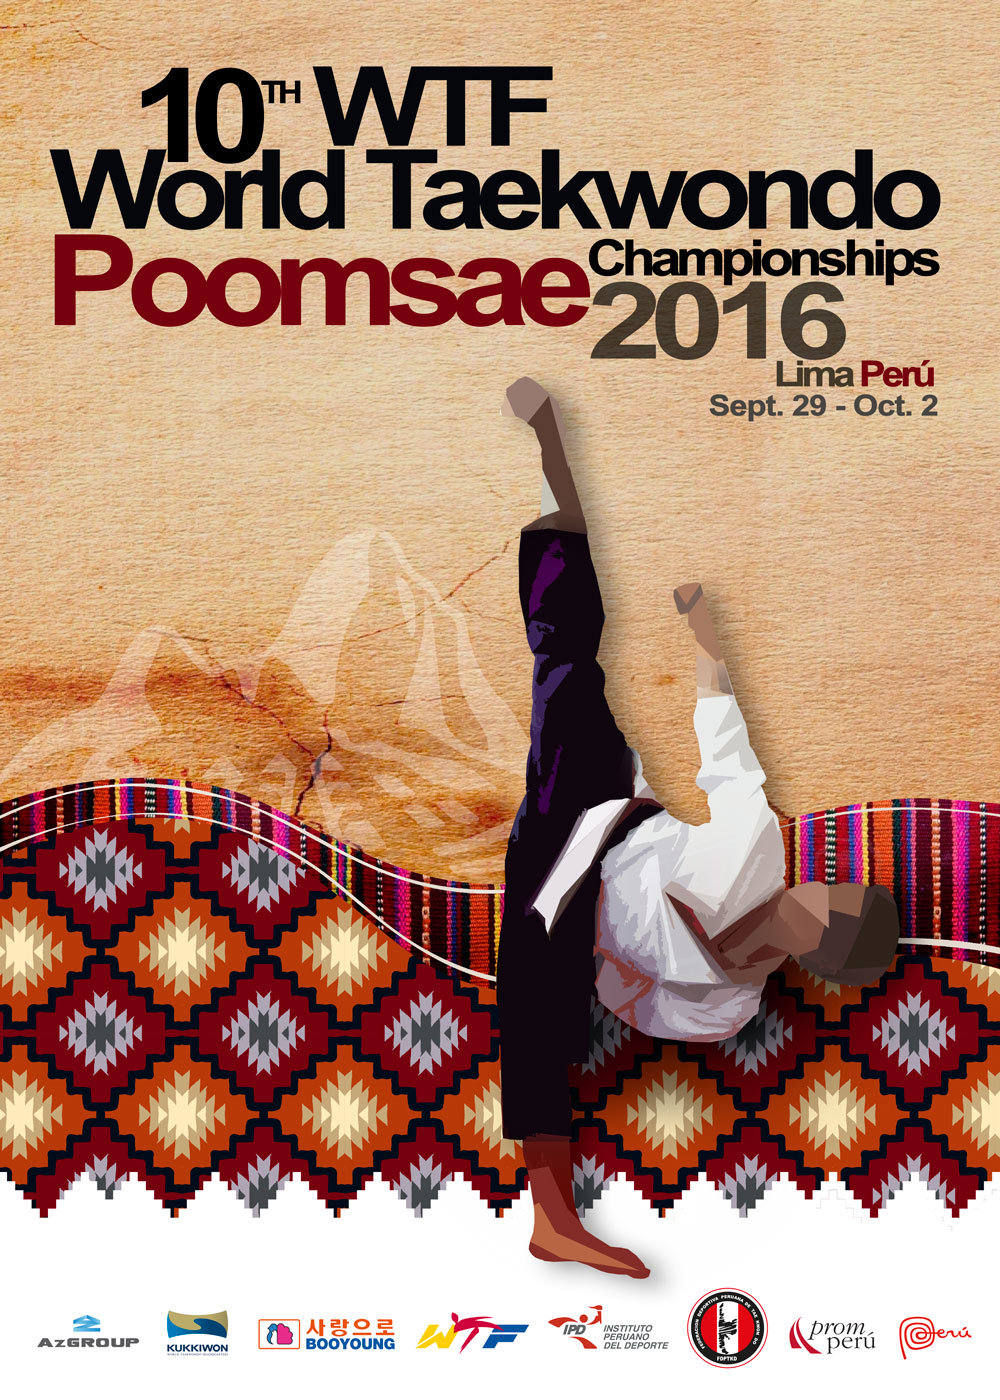 Poster-of-10th-WTF-World-Taekwondo-Poomsae-Championships-2016.jpg